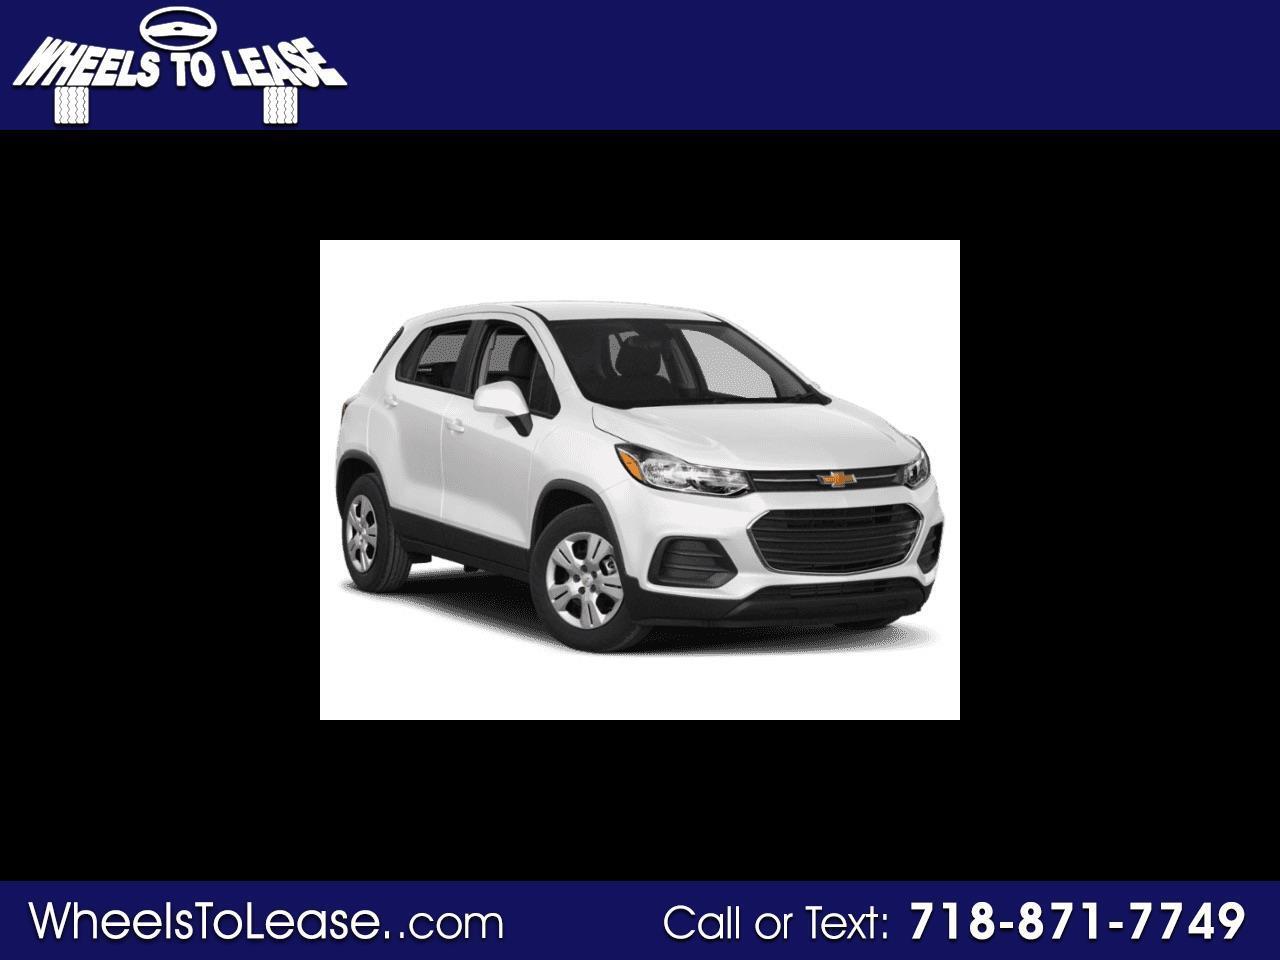 2019 Chevrolet Trax 1LS AWD